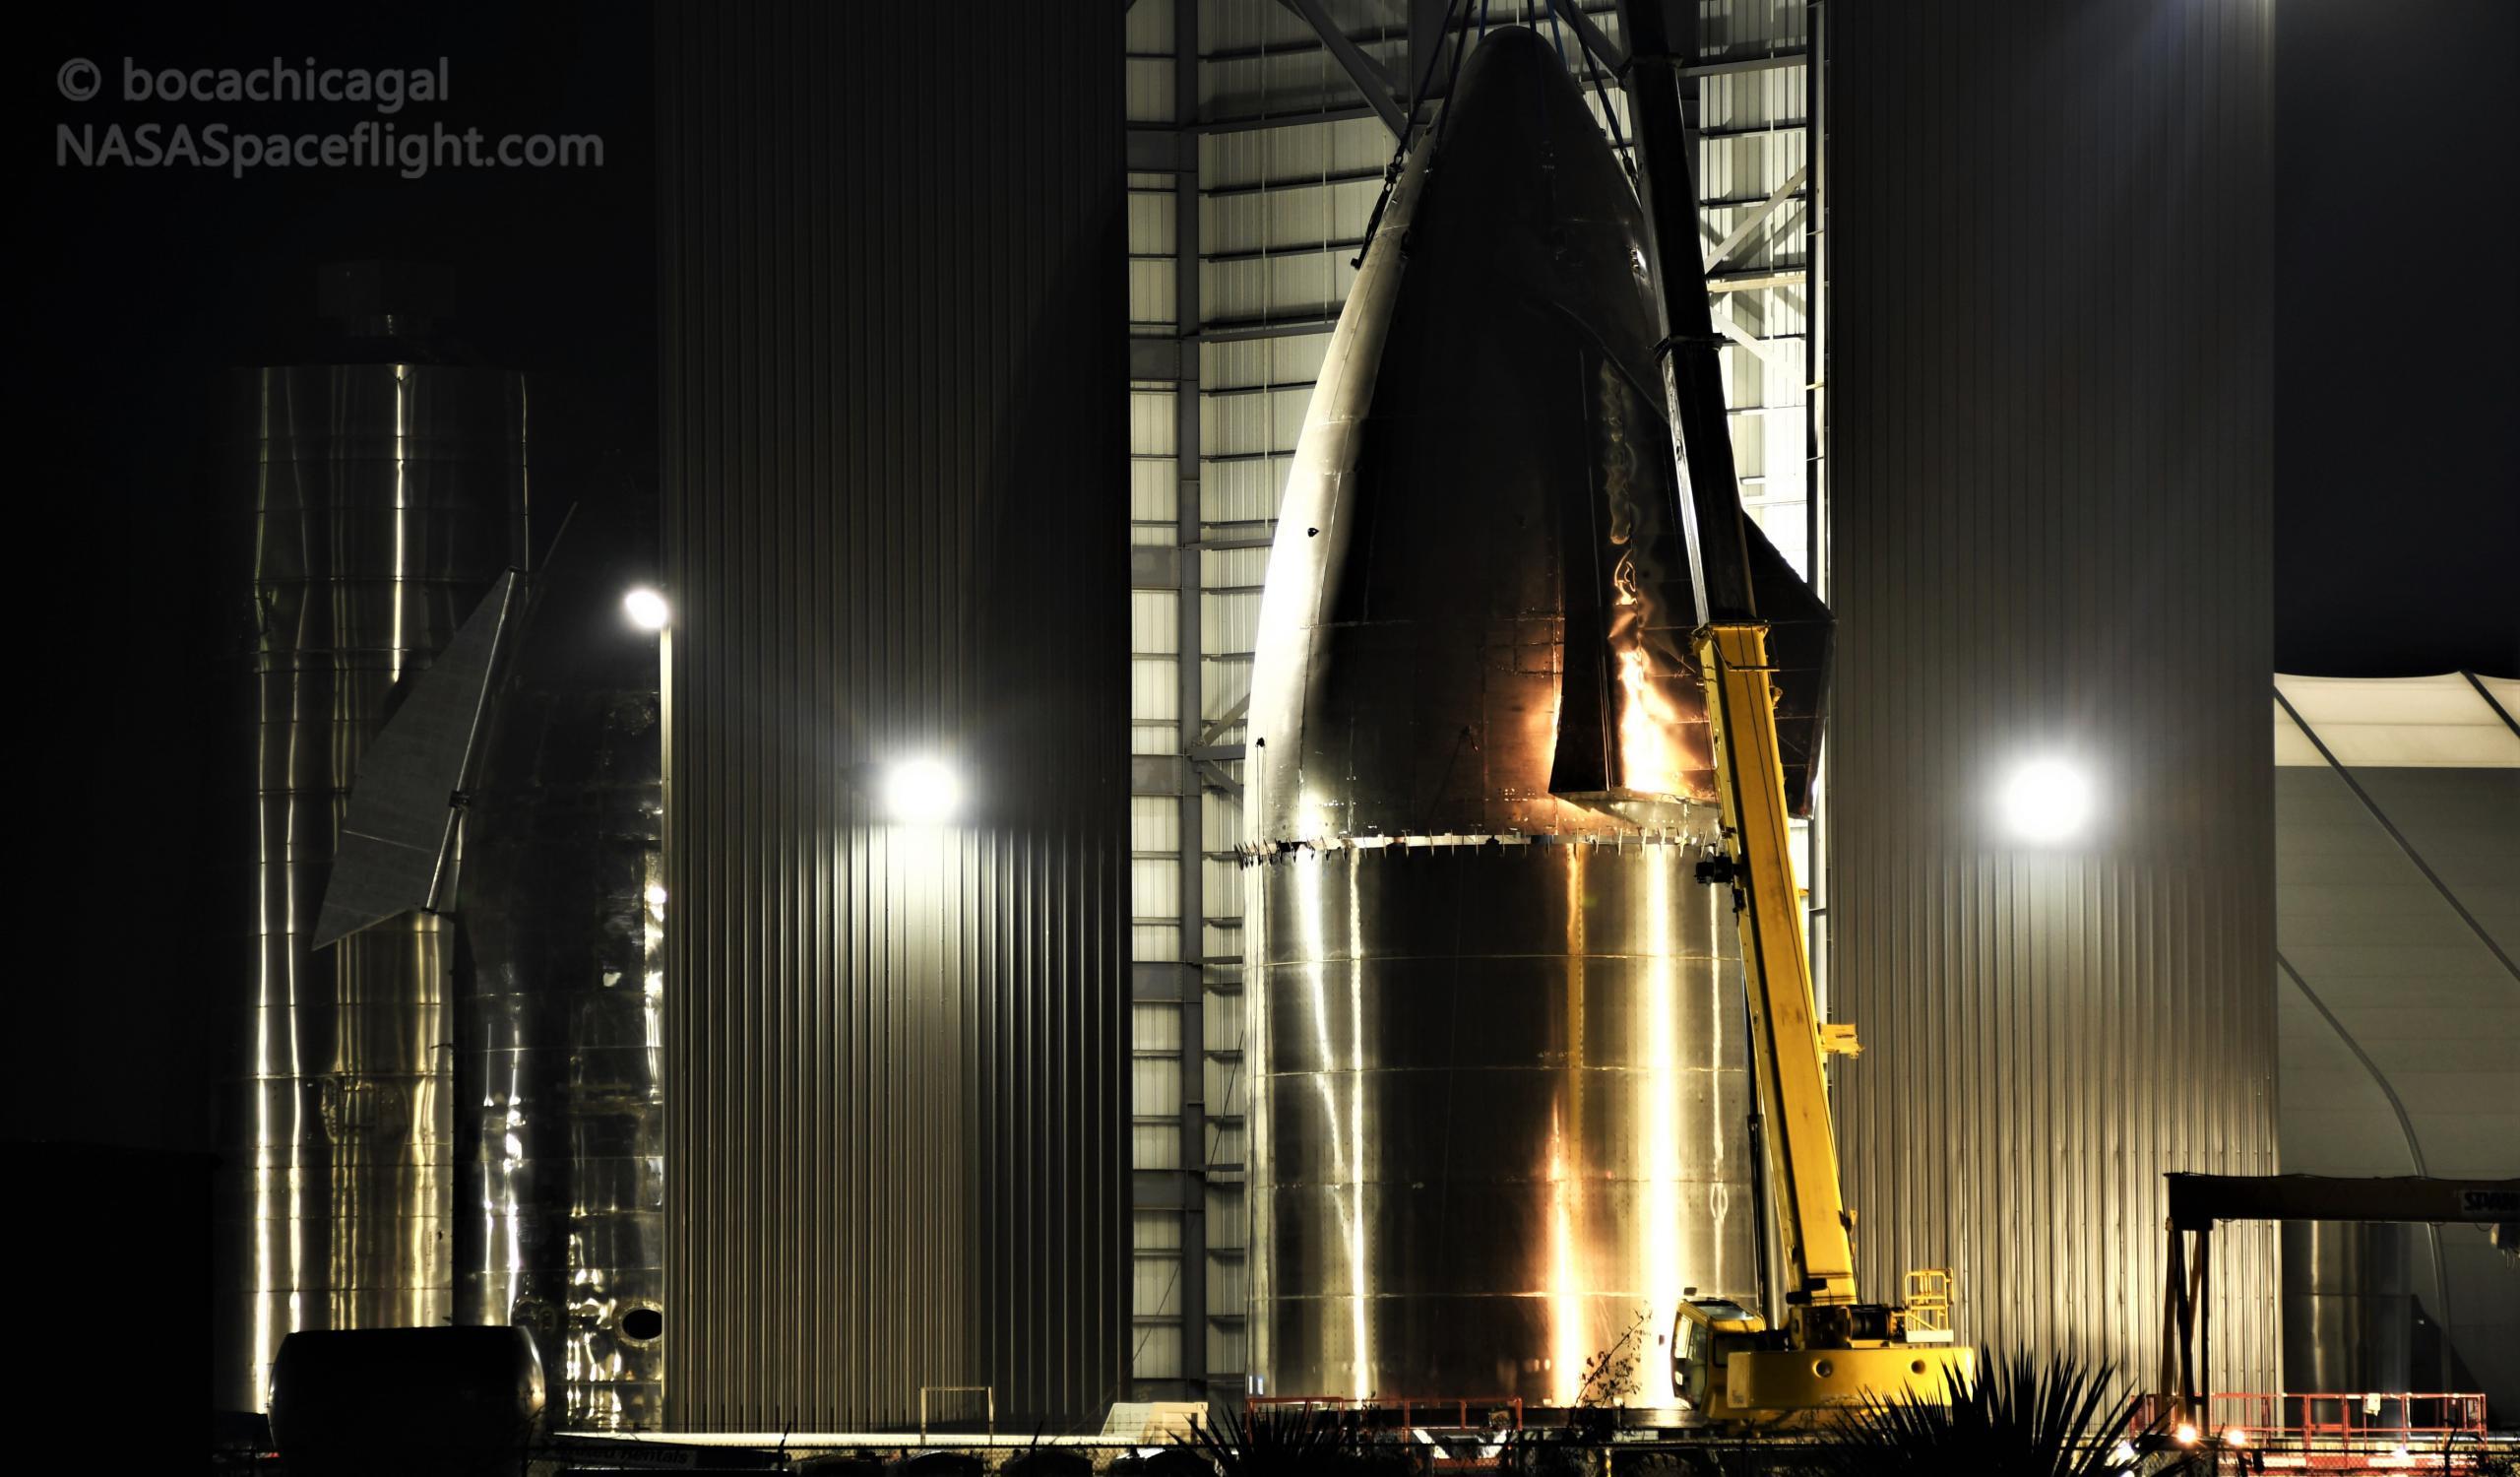 Starship Boca Chica 112020 (NASASpaceflight – bocachicagal) SN9 nosecone stack 2 crop (c)